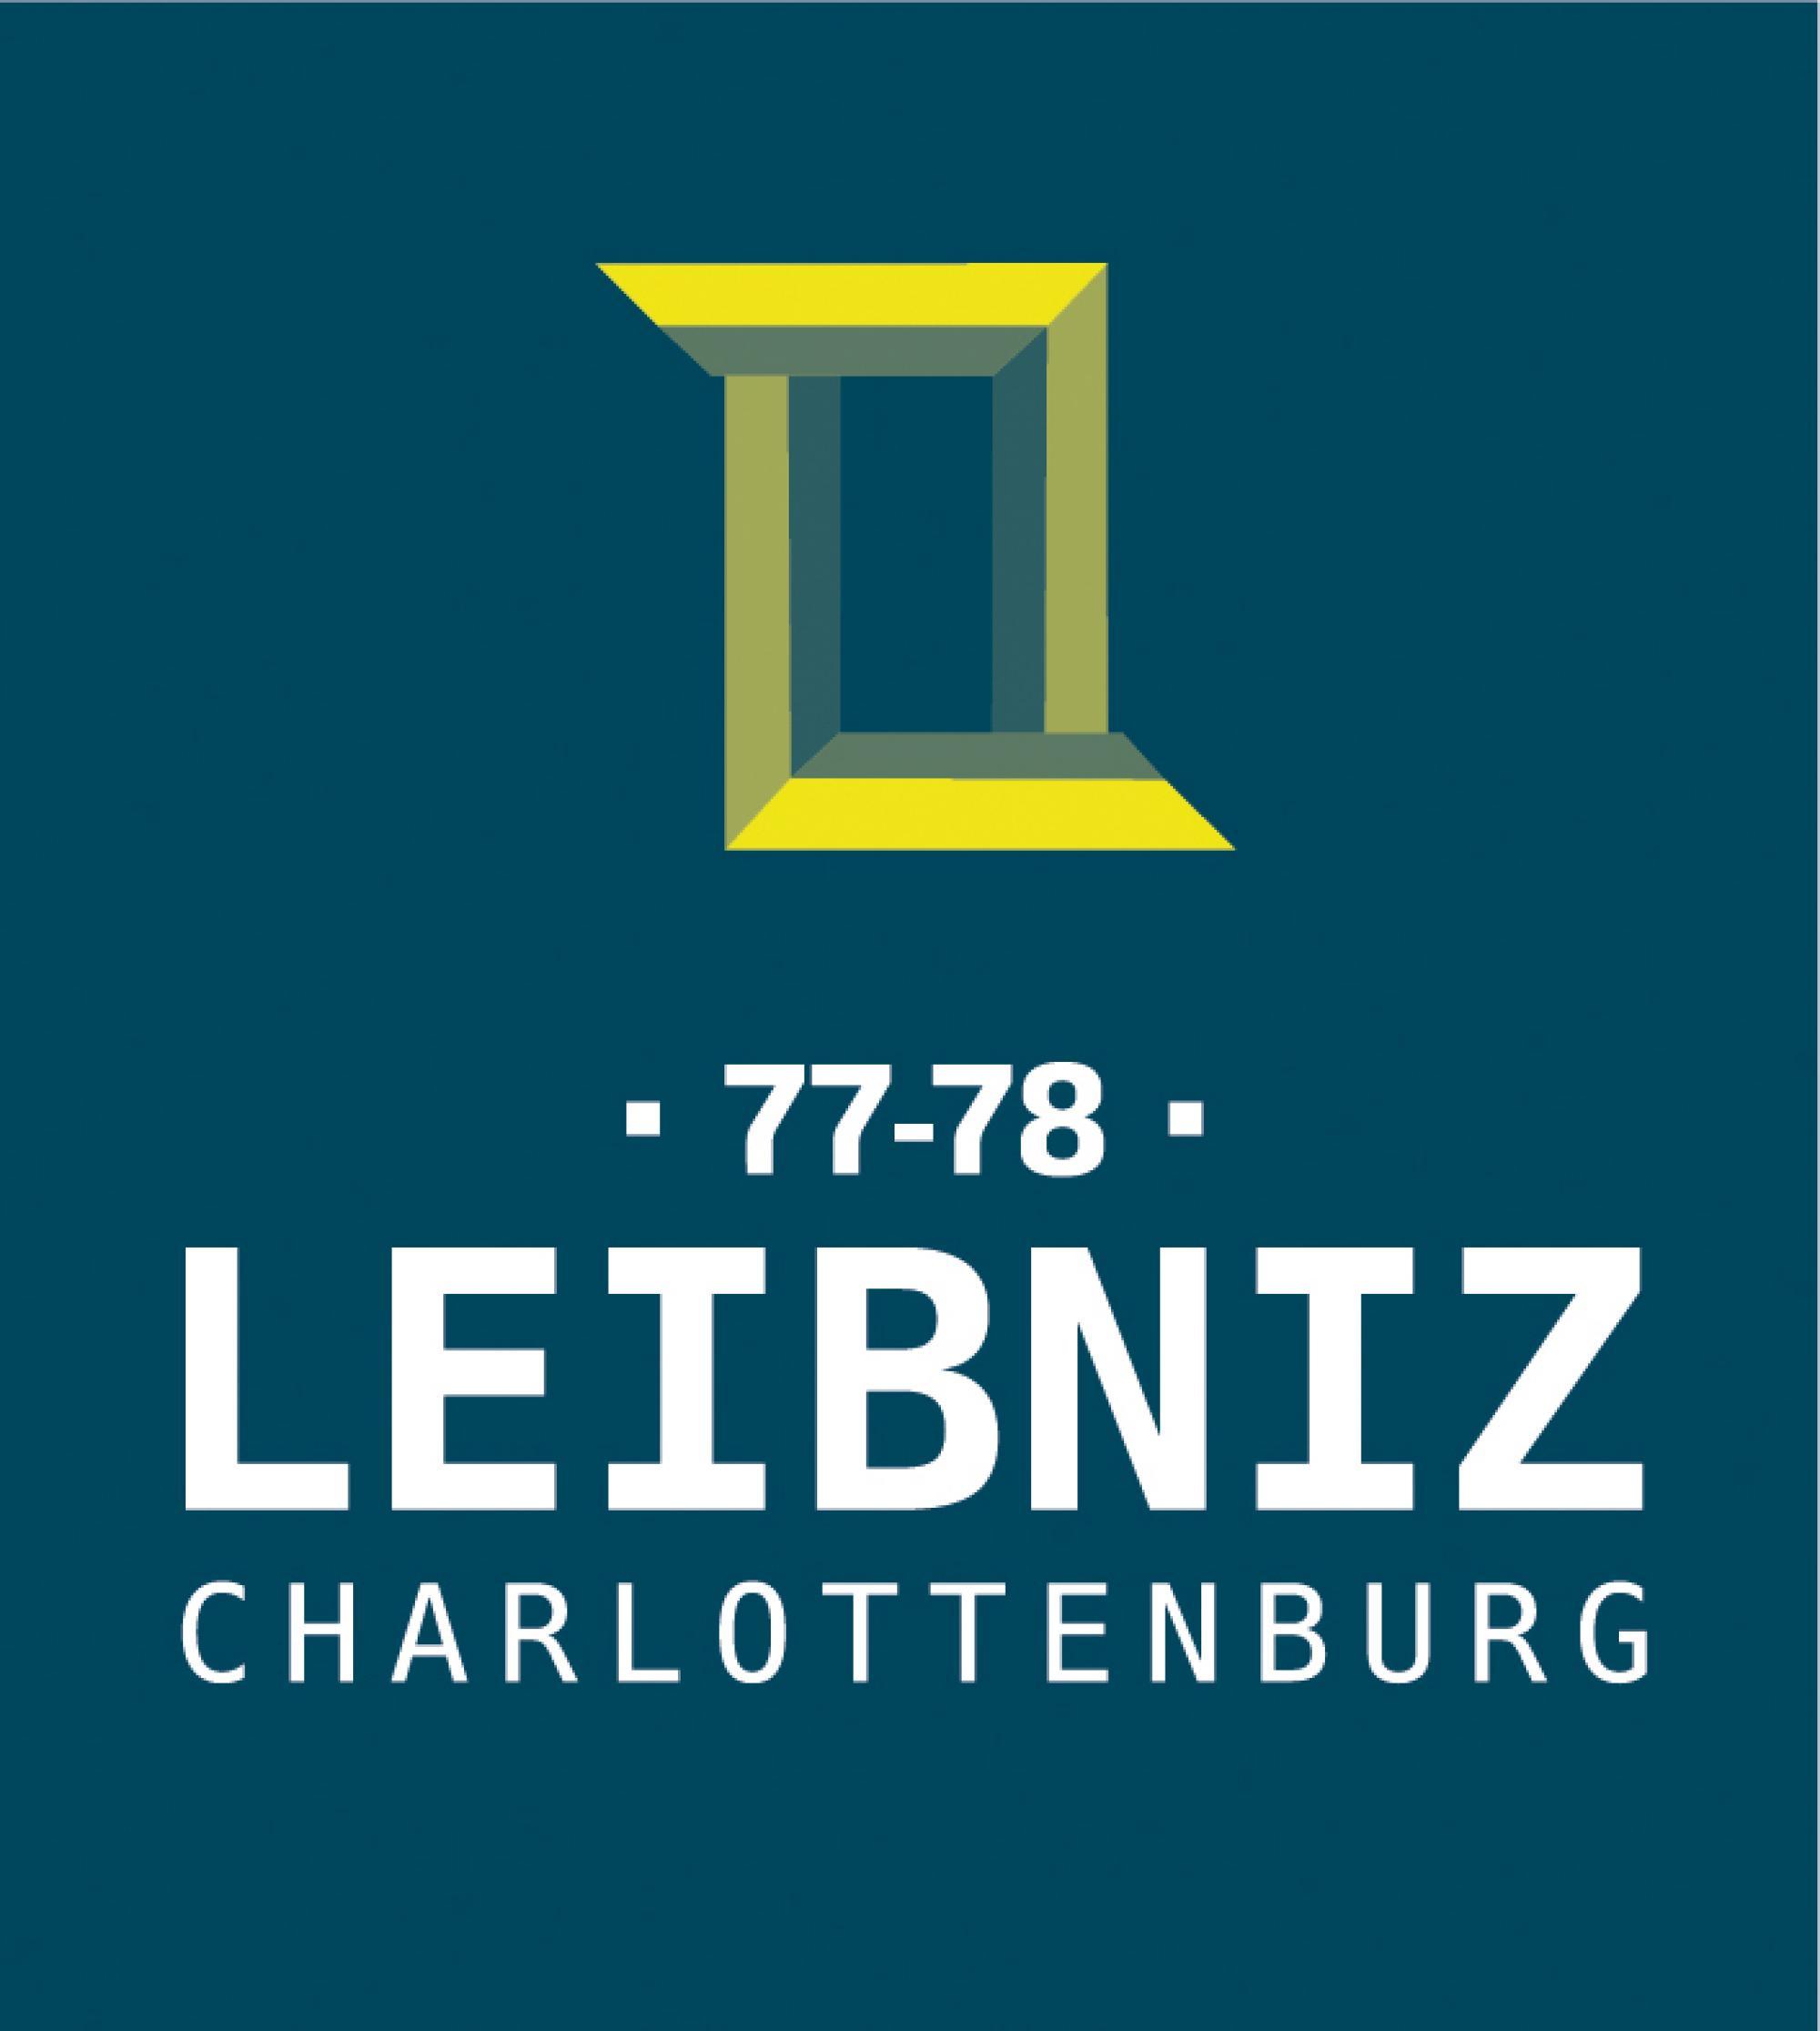 Leibniz-Logo-Design-Trendcity-Immobilien-FORMLOS-berlin